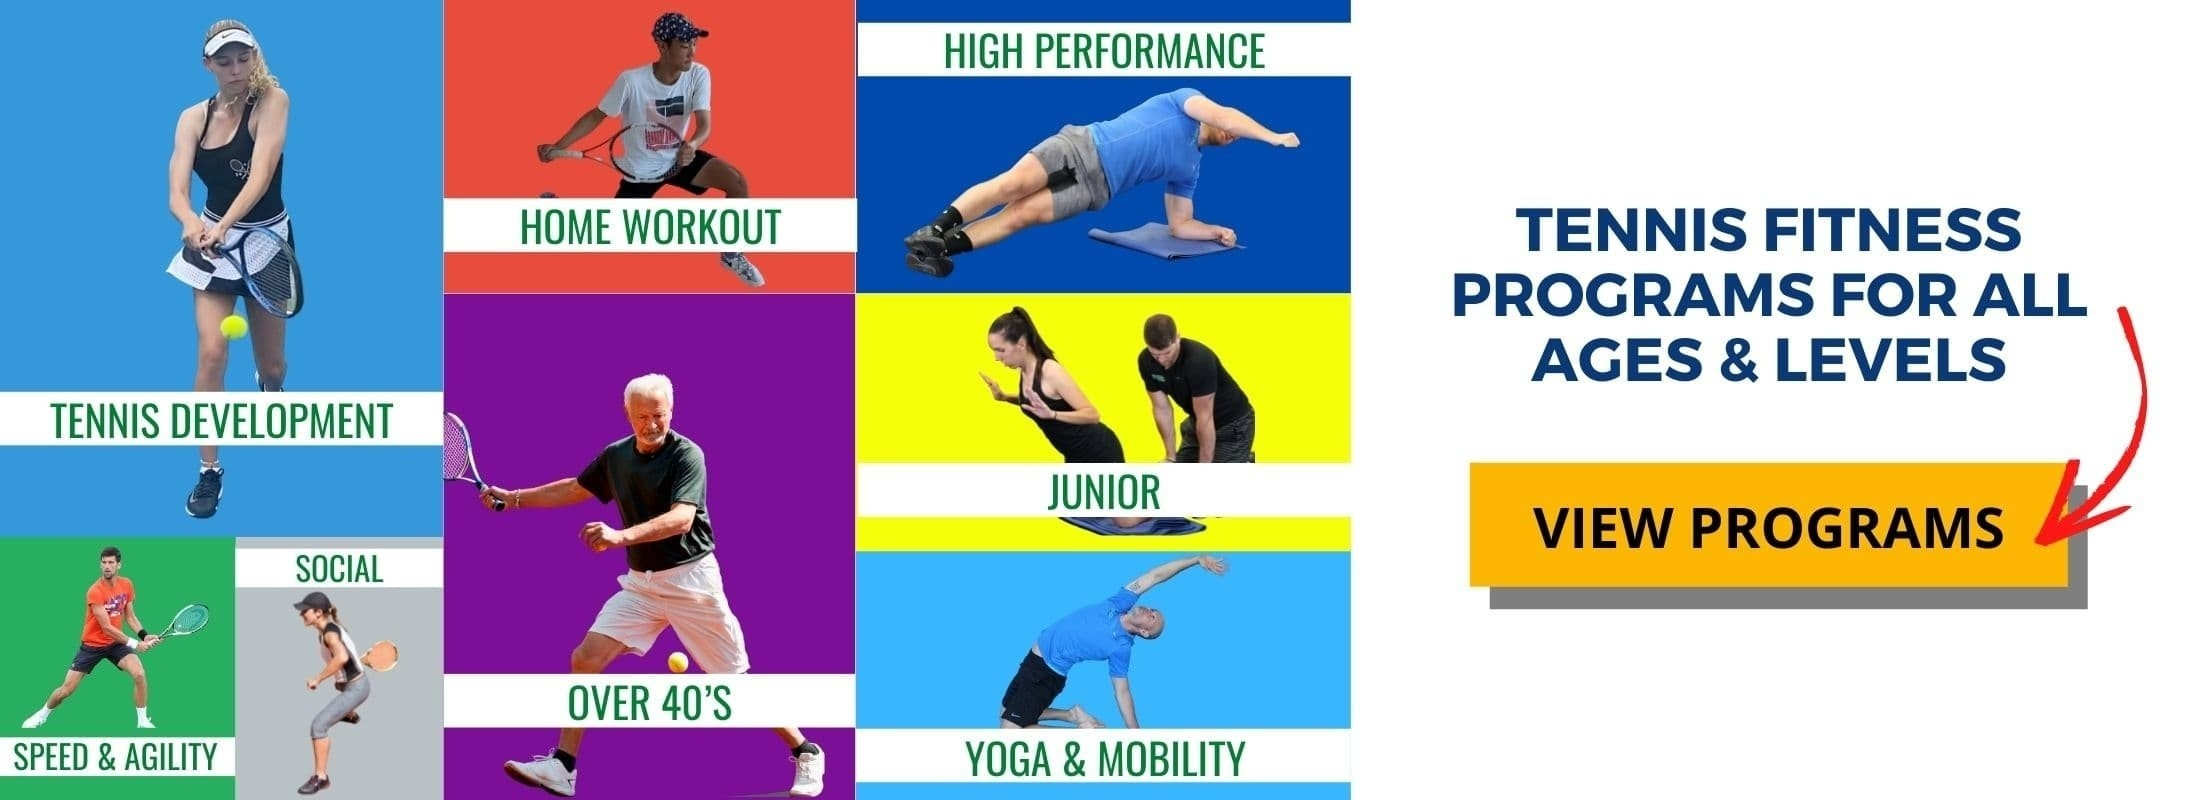 tennis-fitness-program